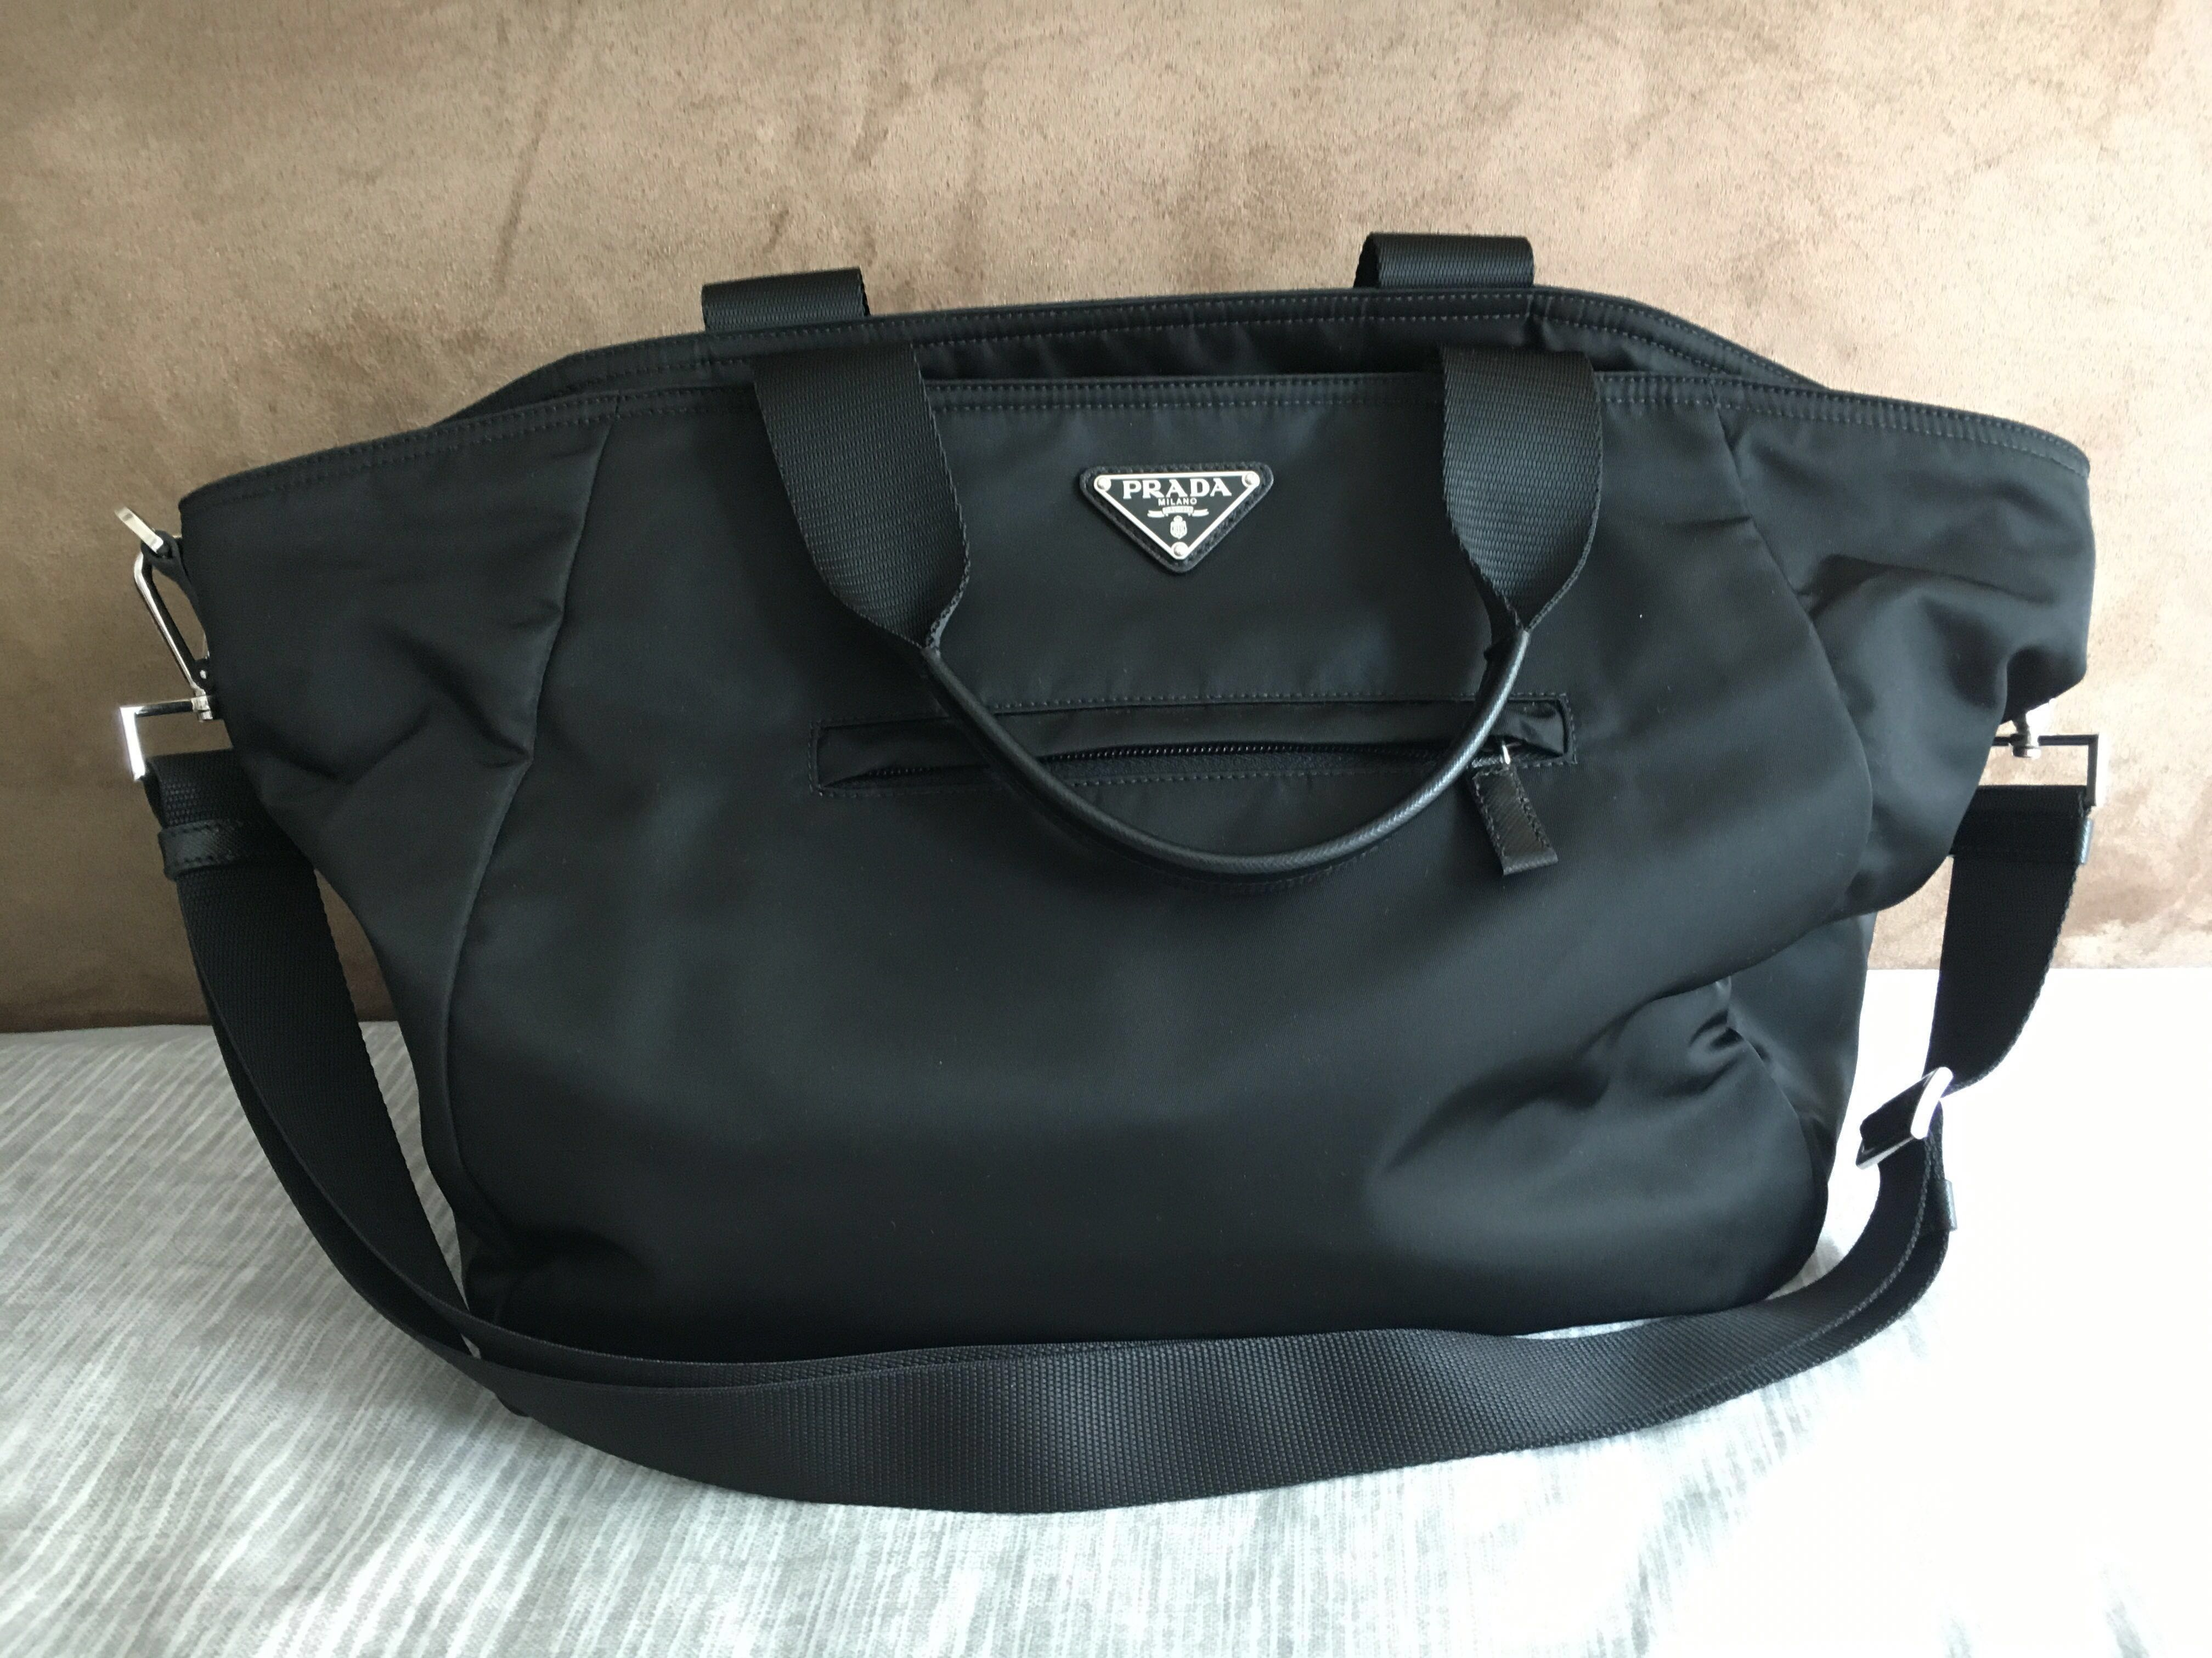 c1014faf0aa ... promo code for prada vela nylon tote bag womens fashion womens bags  wallets on carousell 12061 reduced luxury accessoriesbags prada black ...